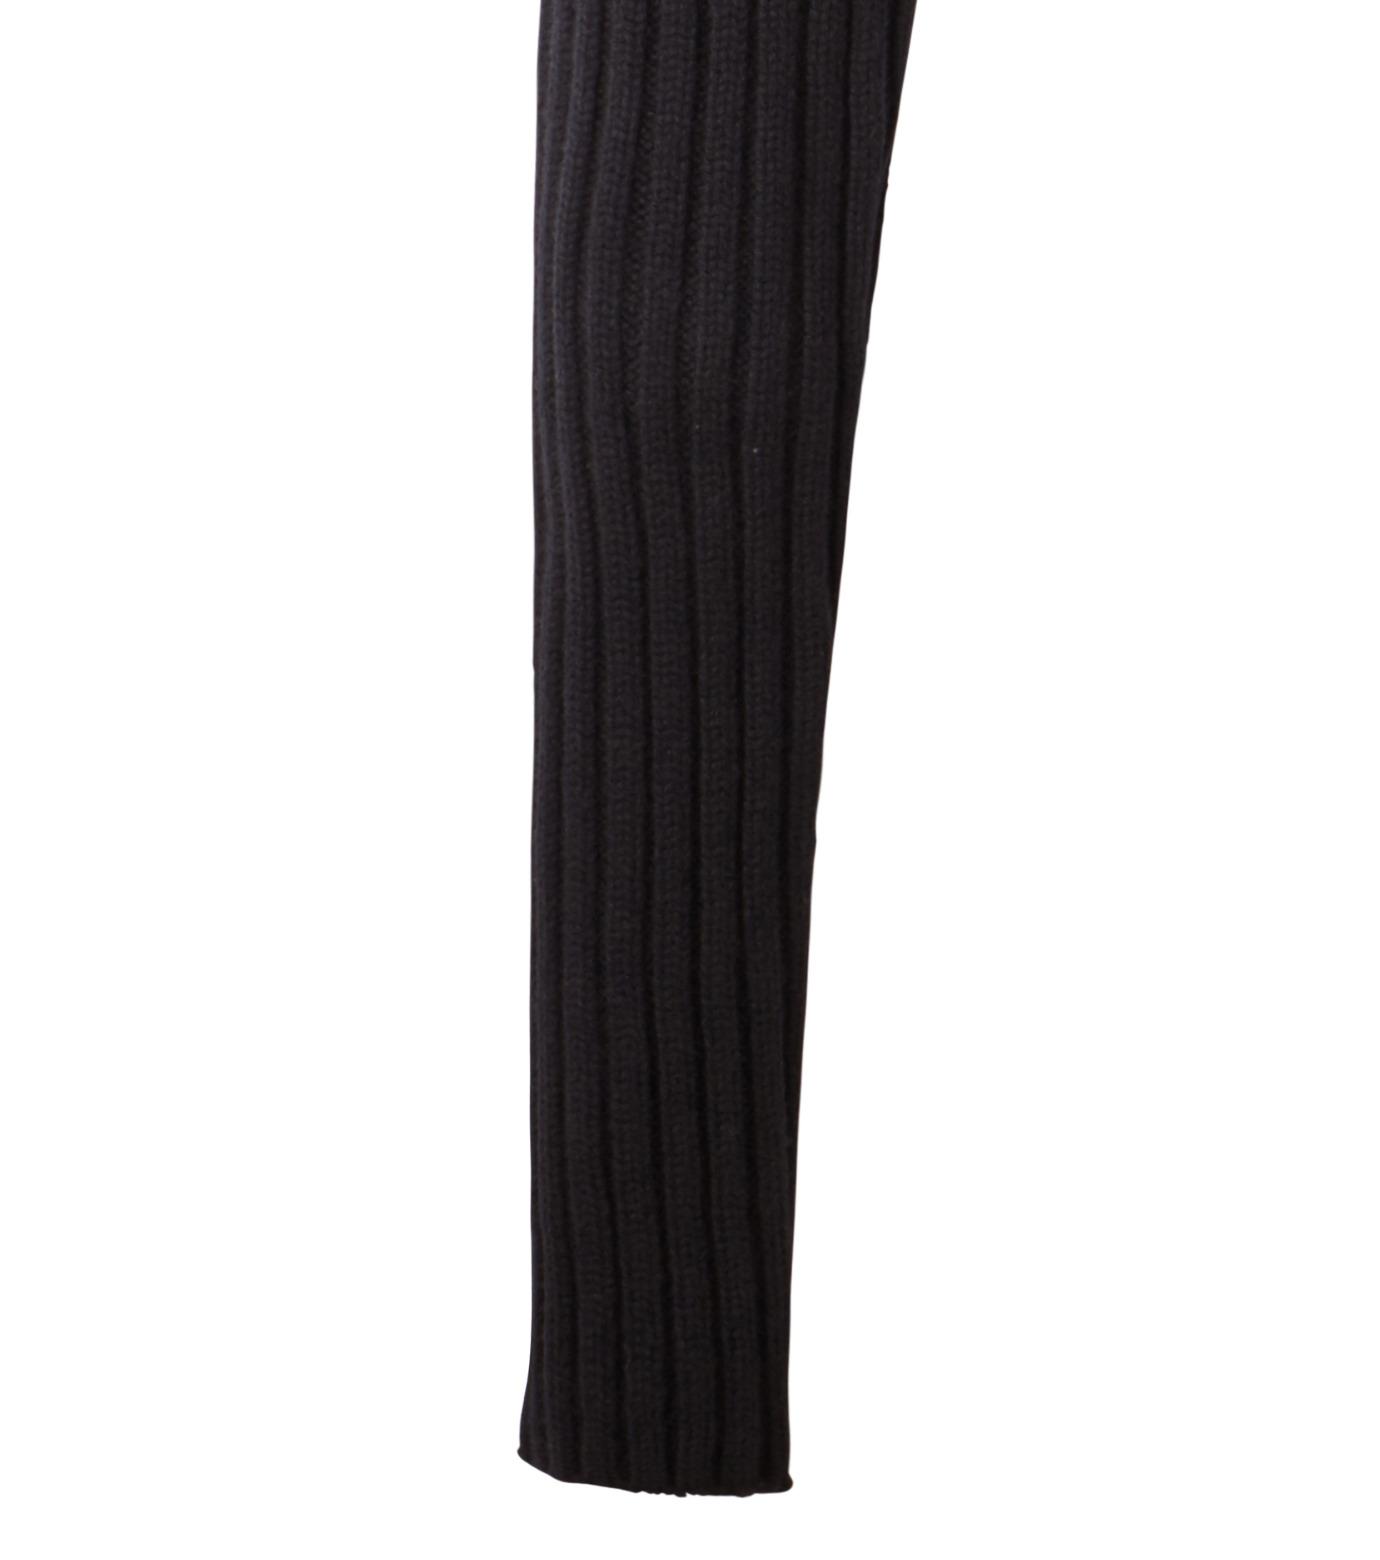 DRESSEDUNDRESSED(ドレスドアンドレスド)のKnit Sleeve-BLACK(アクセサリー/accessory)-DUW16281-13 拡大詳細画像3